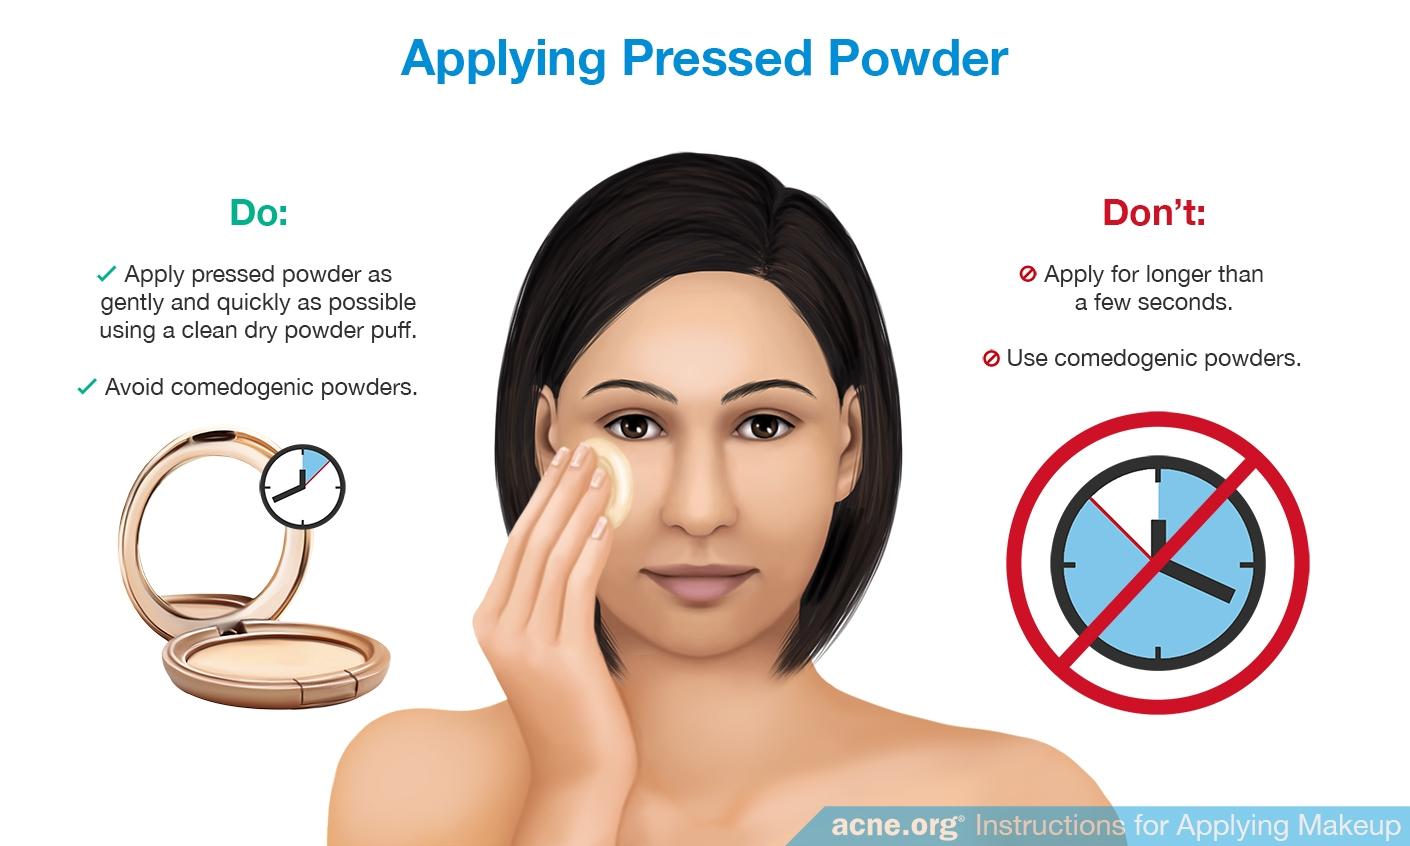 Applying Pressed Powder to Acne-prone Skin